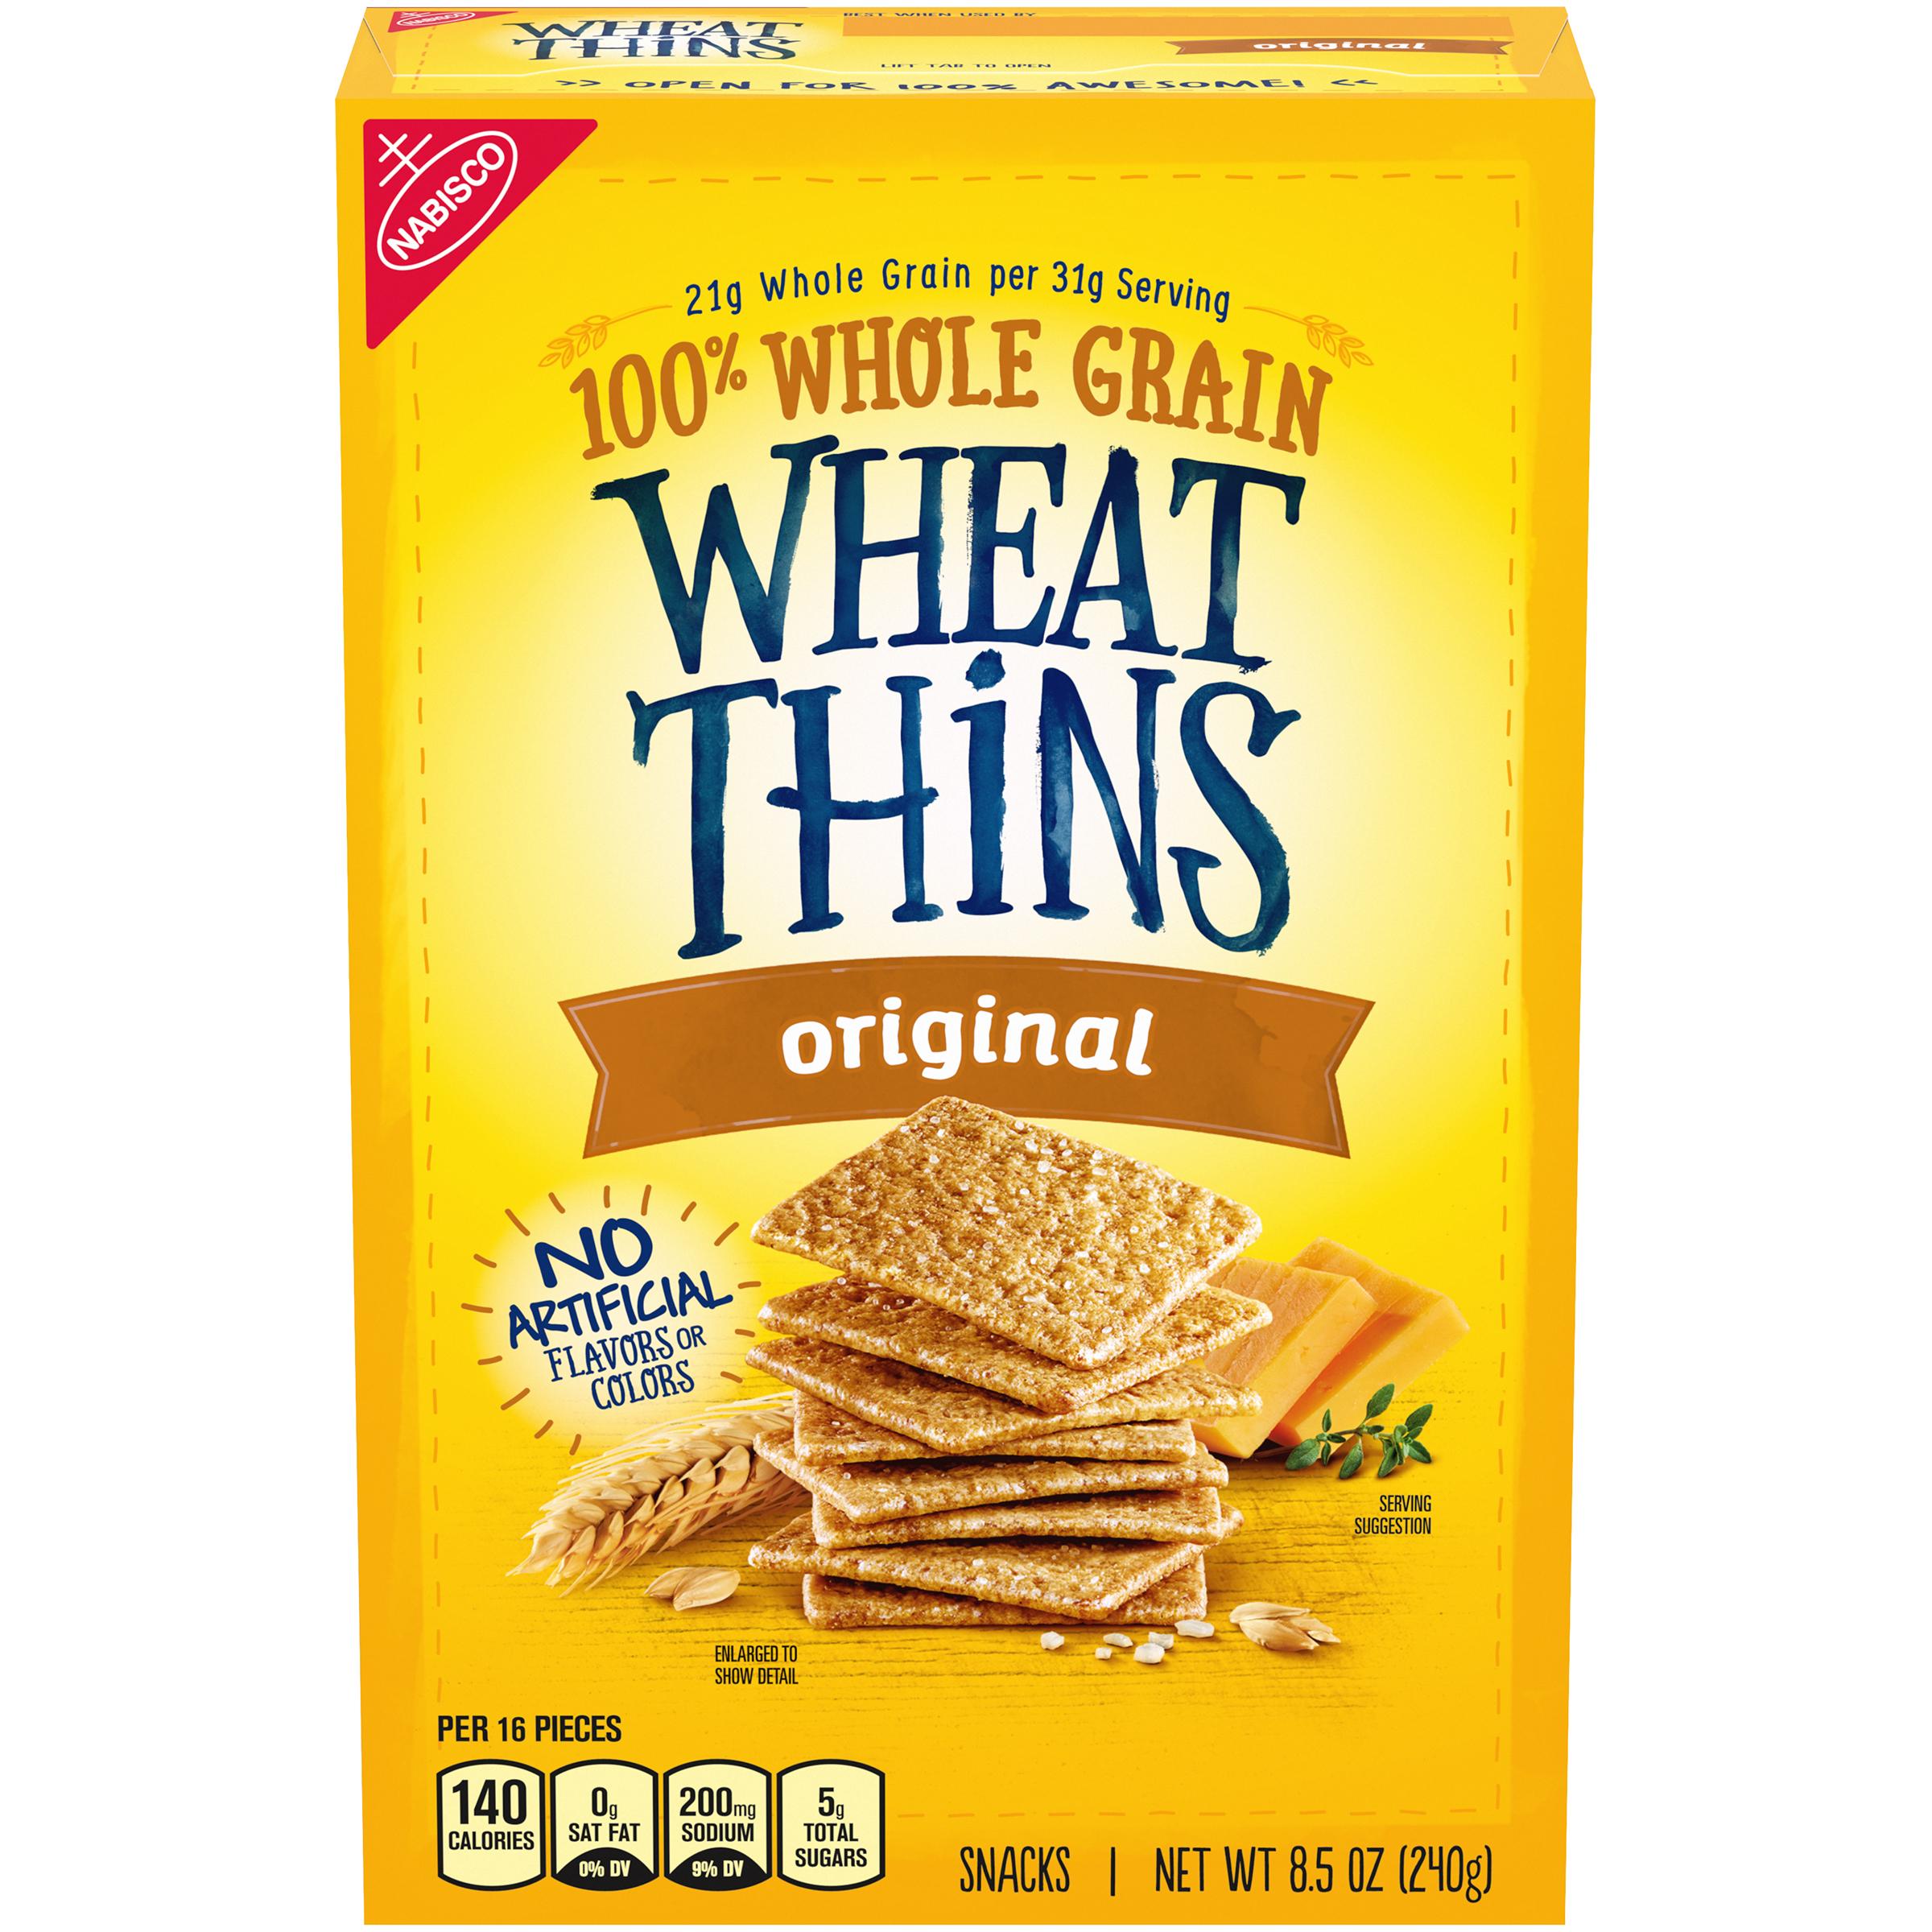 WHEAT THINS Original Crackers 8.5 Oz